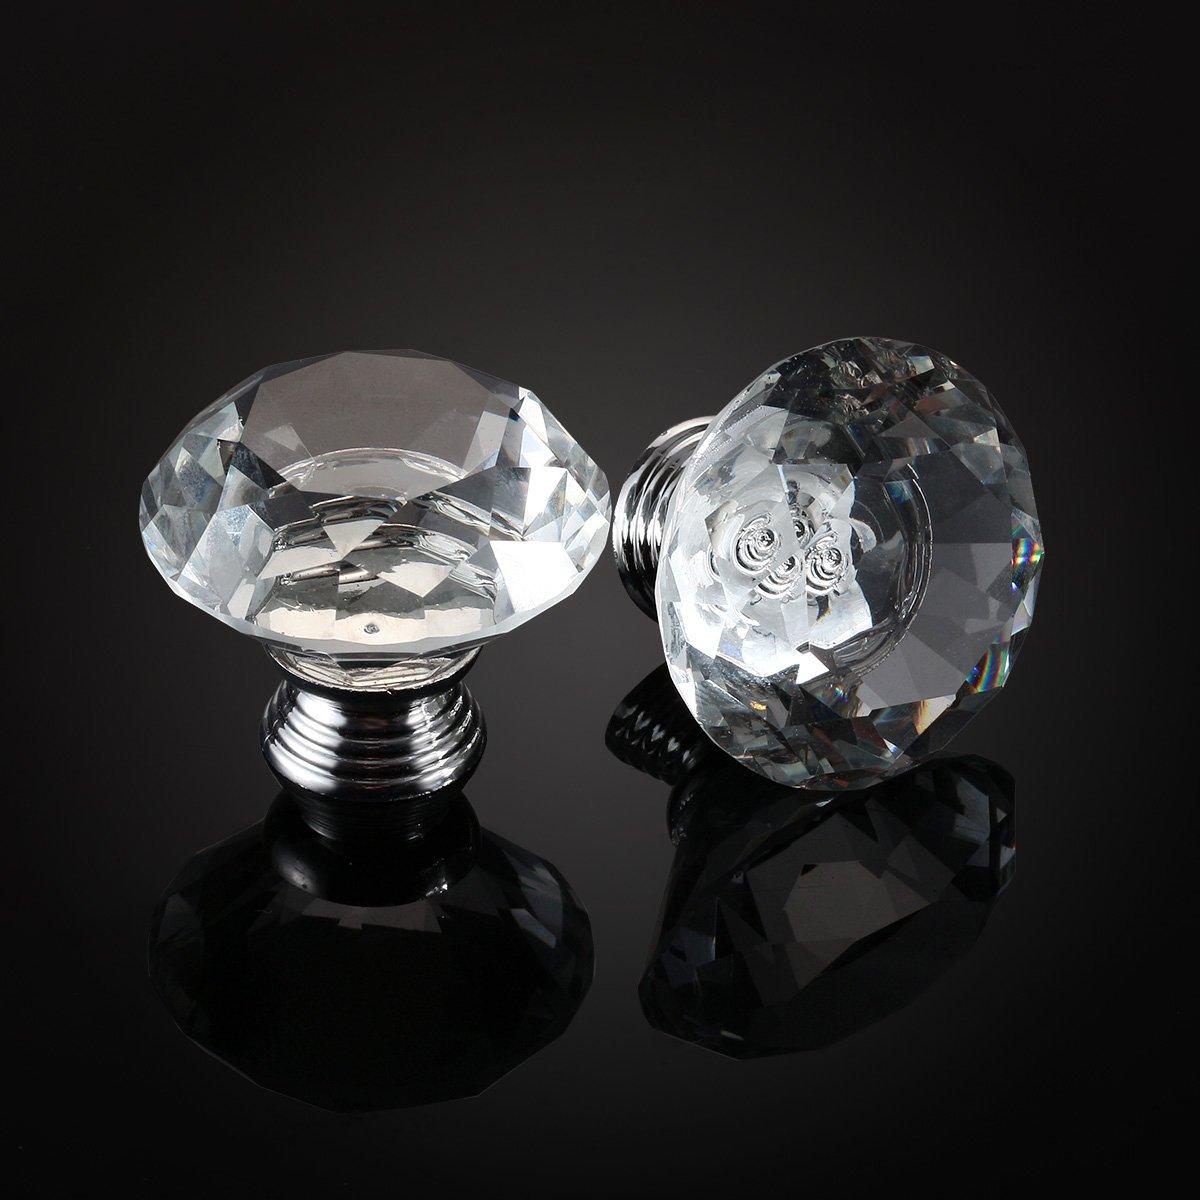 10pcs 40mm Crystal Glass Diamo...